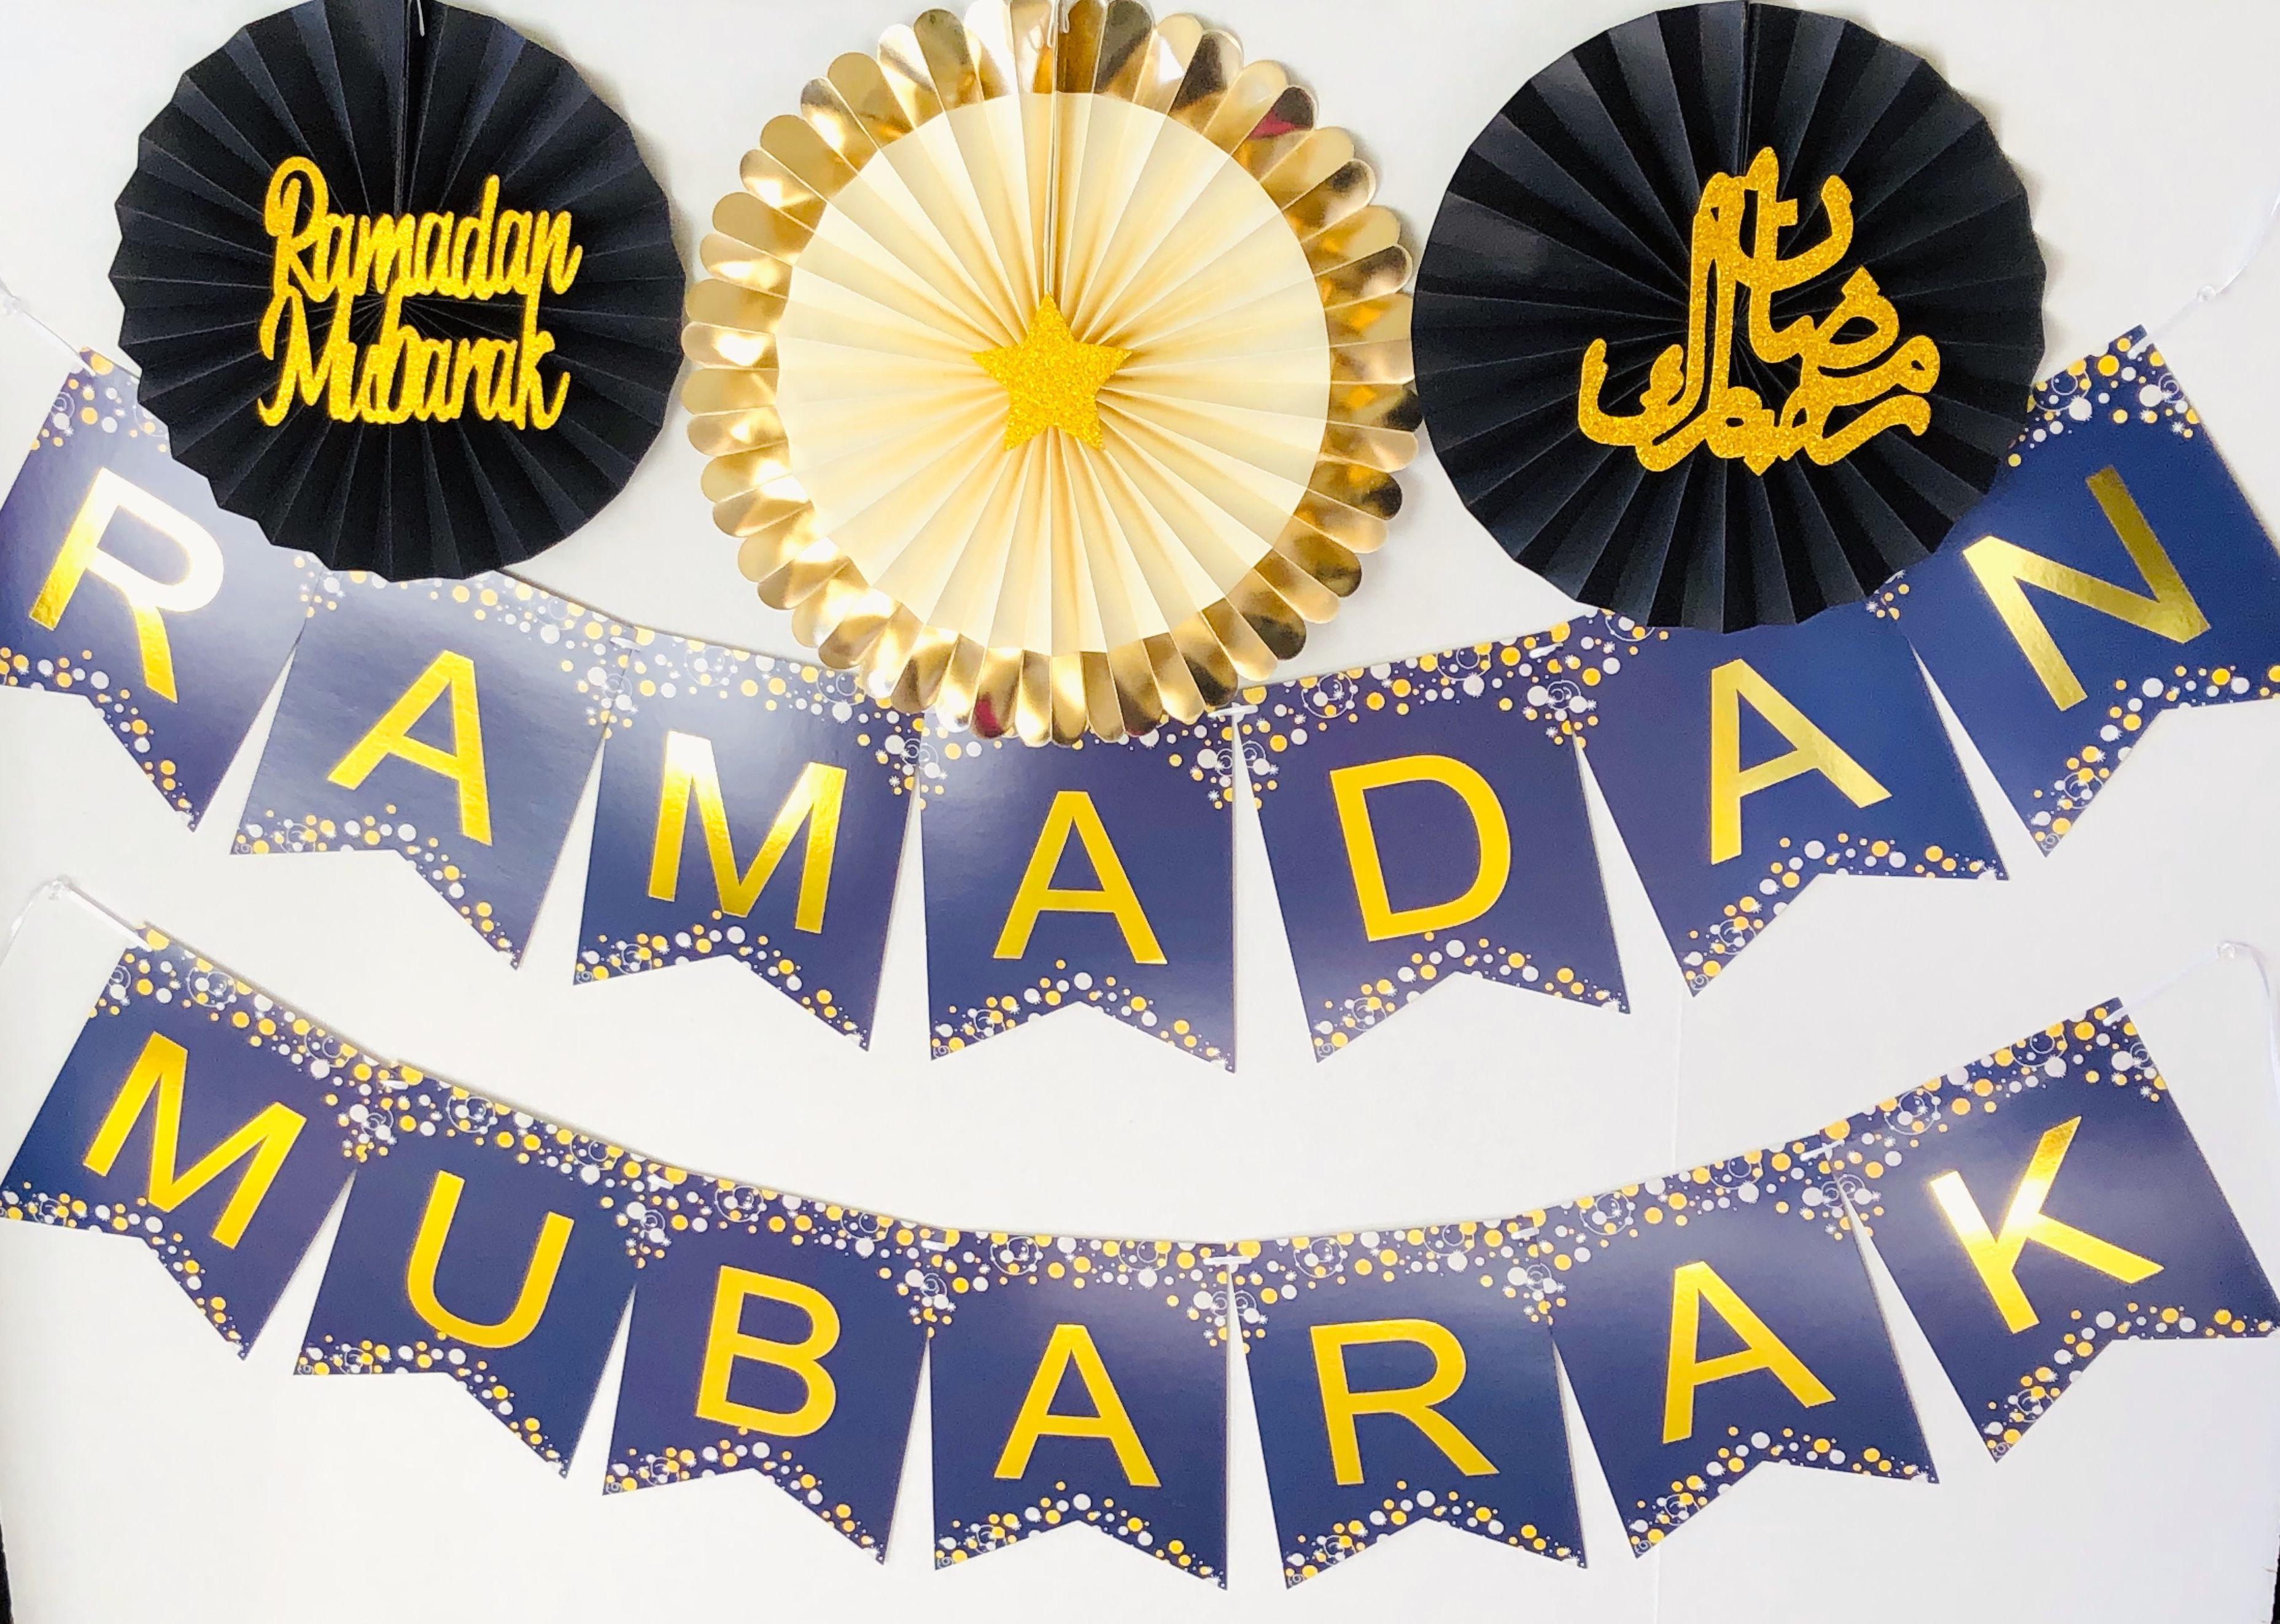 Pre Assembled Elegant Design Ramadan Banner Ramadan Mubarak Banner with Black Silver Paper Fans Beautiful